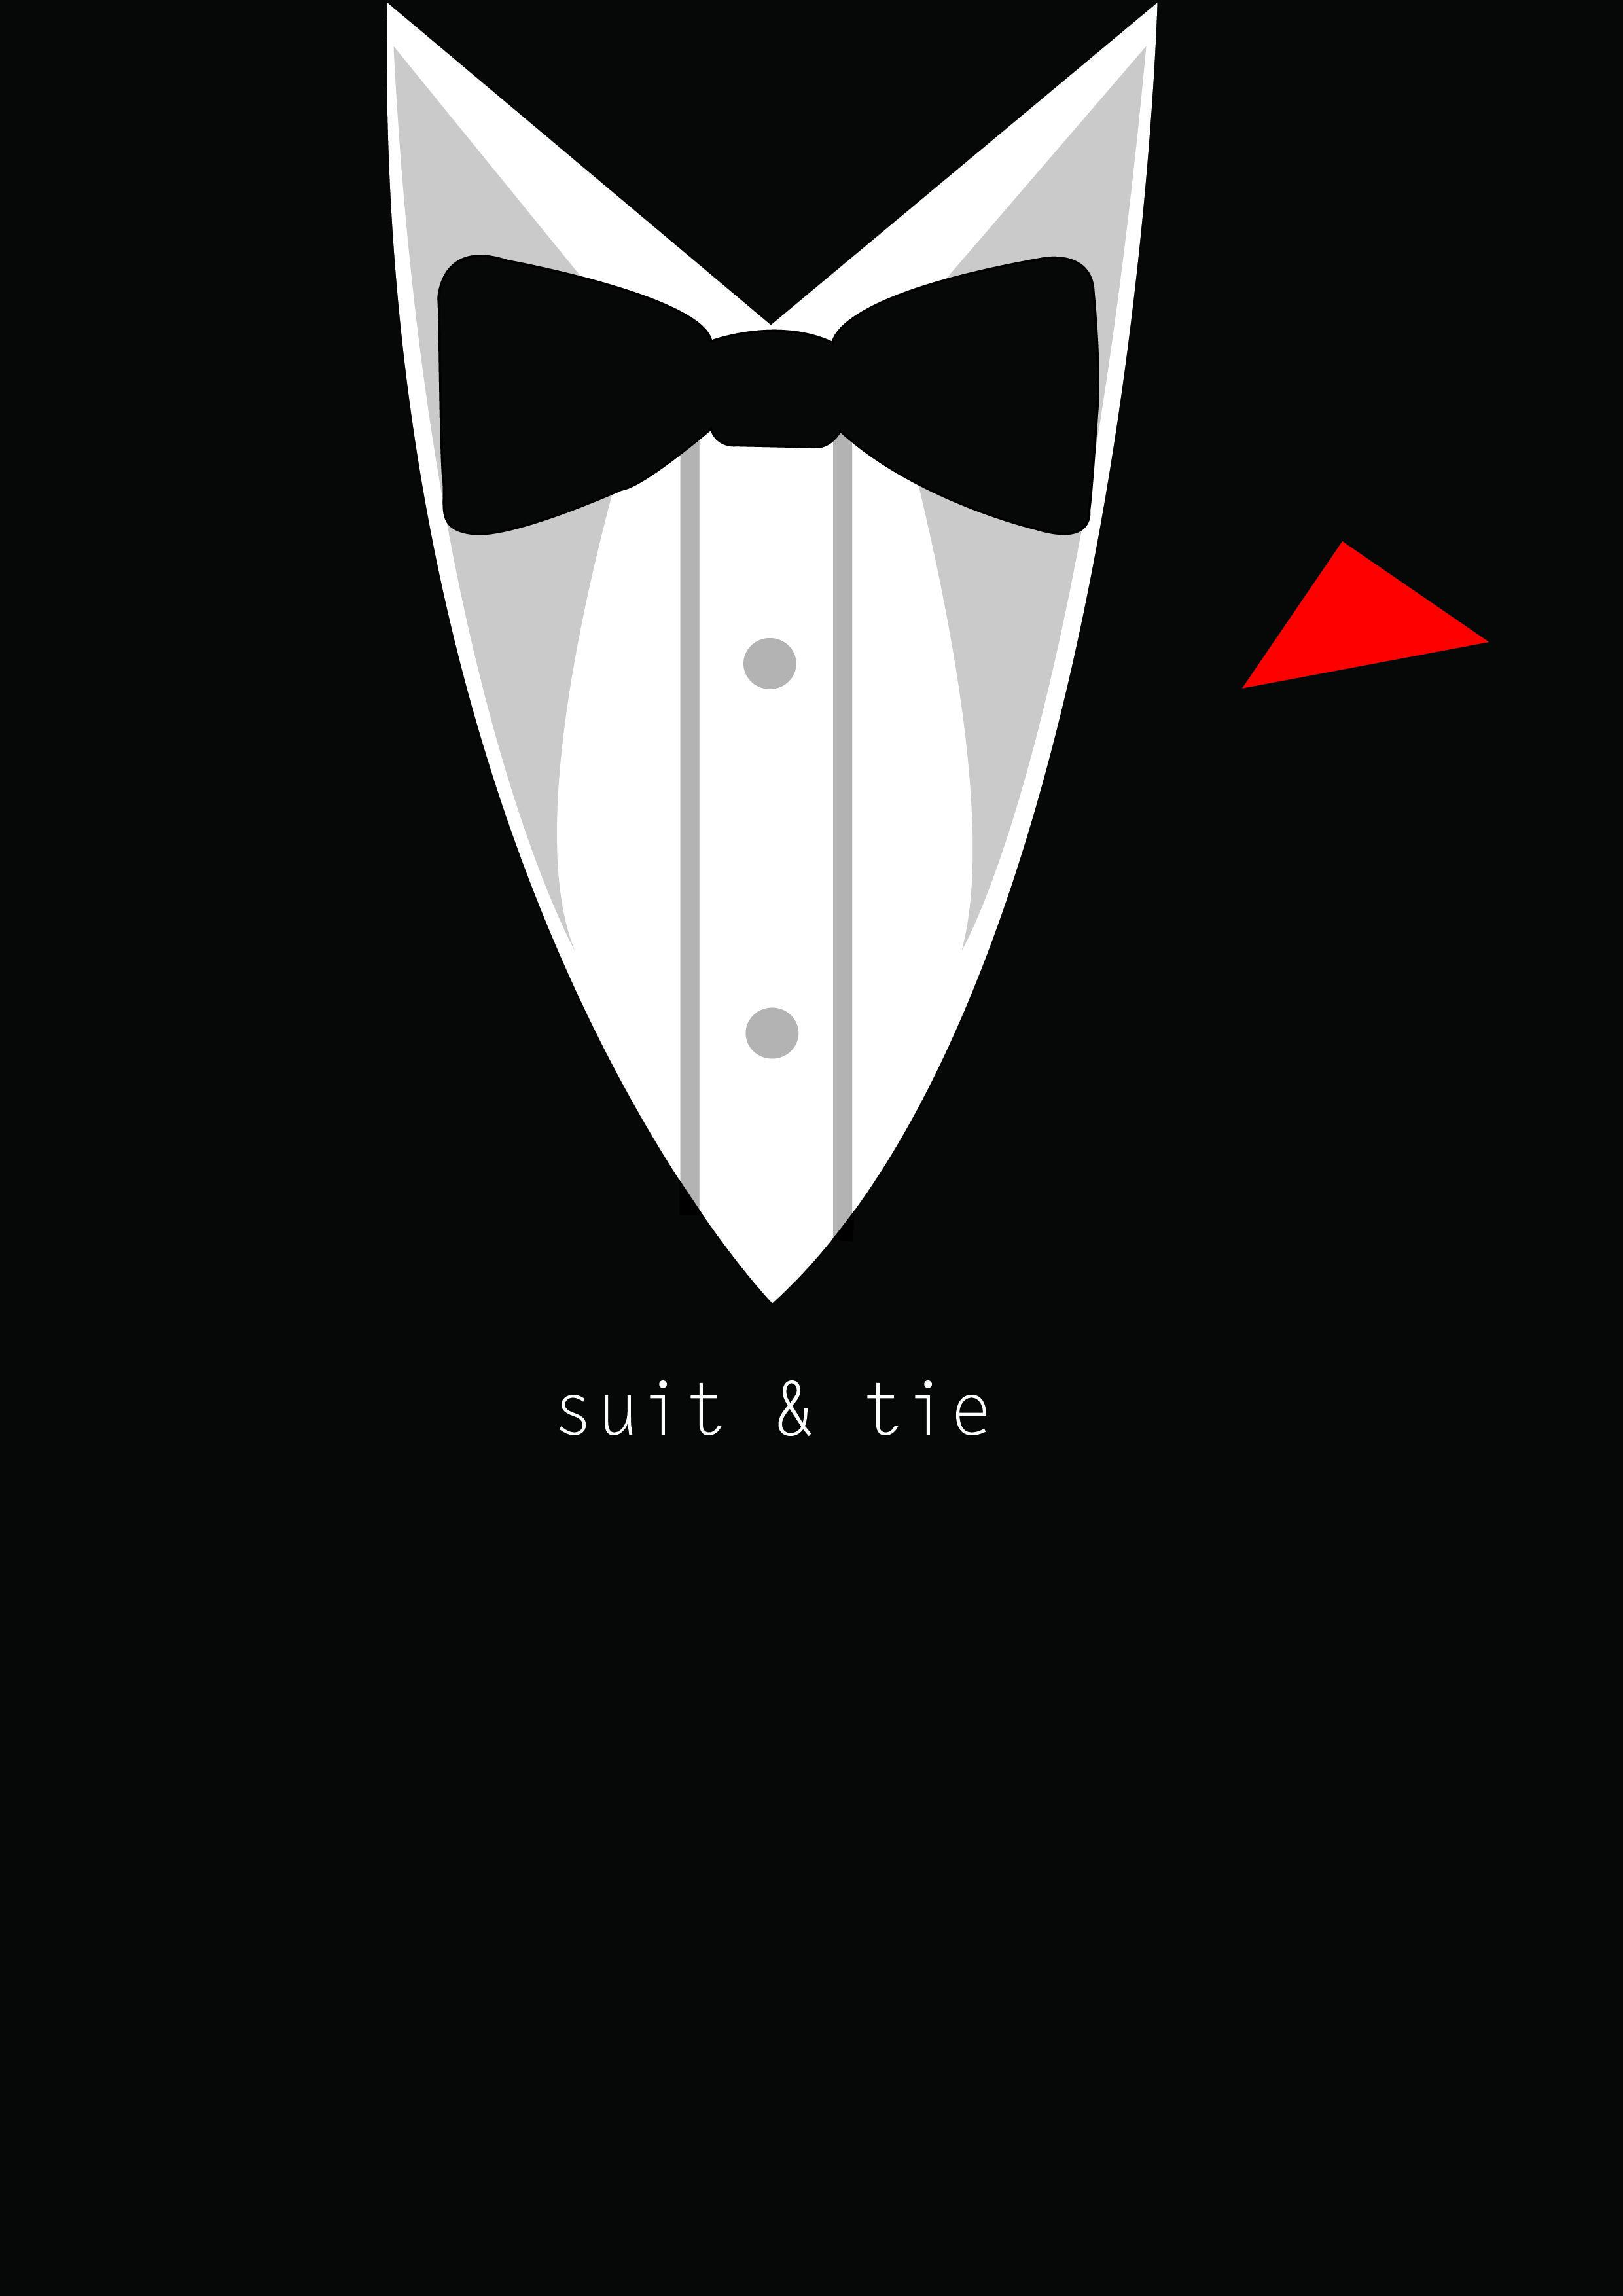 suit tie illustration google search the rat pack